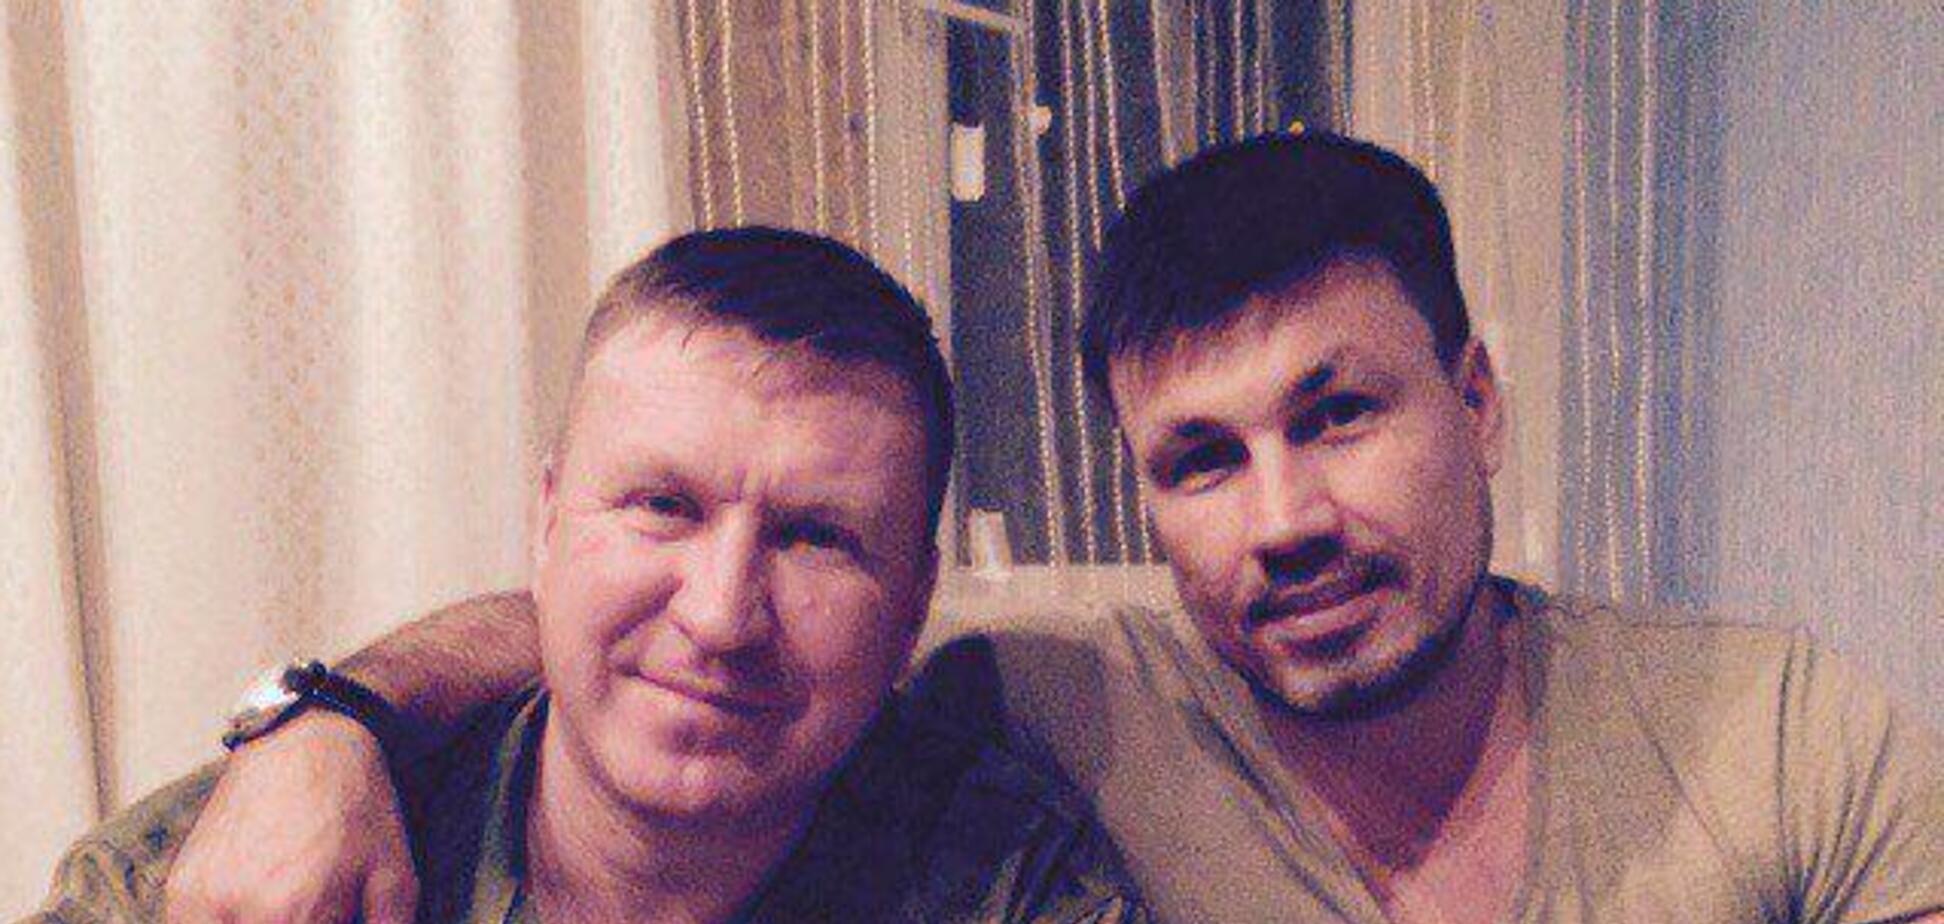 Скандального террориста 'ДНР' заметили на доске почета в РФ